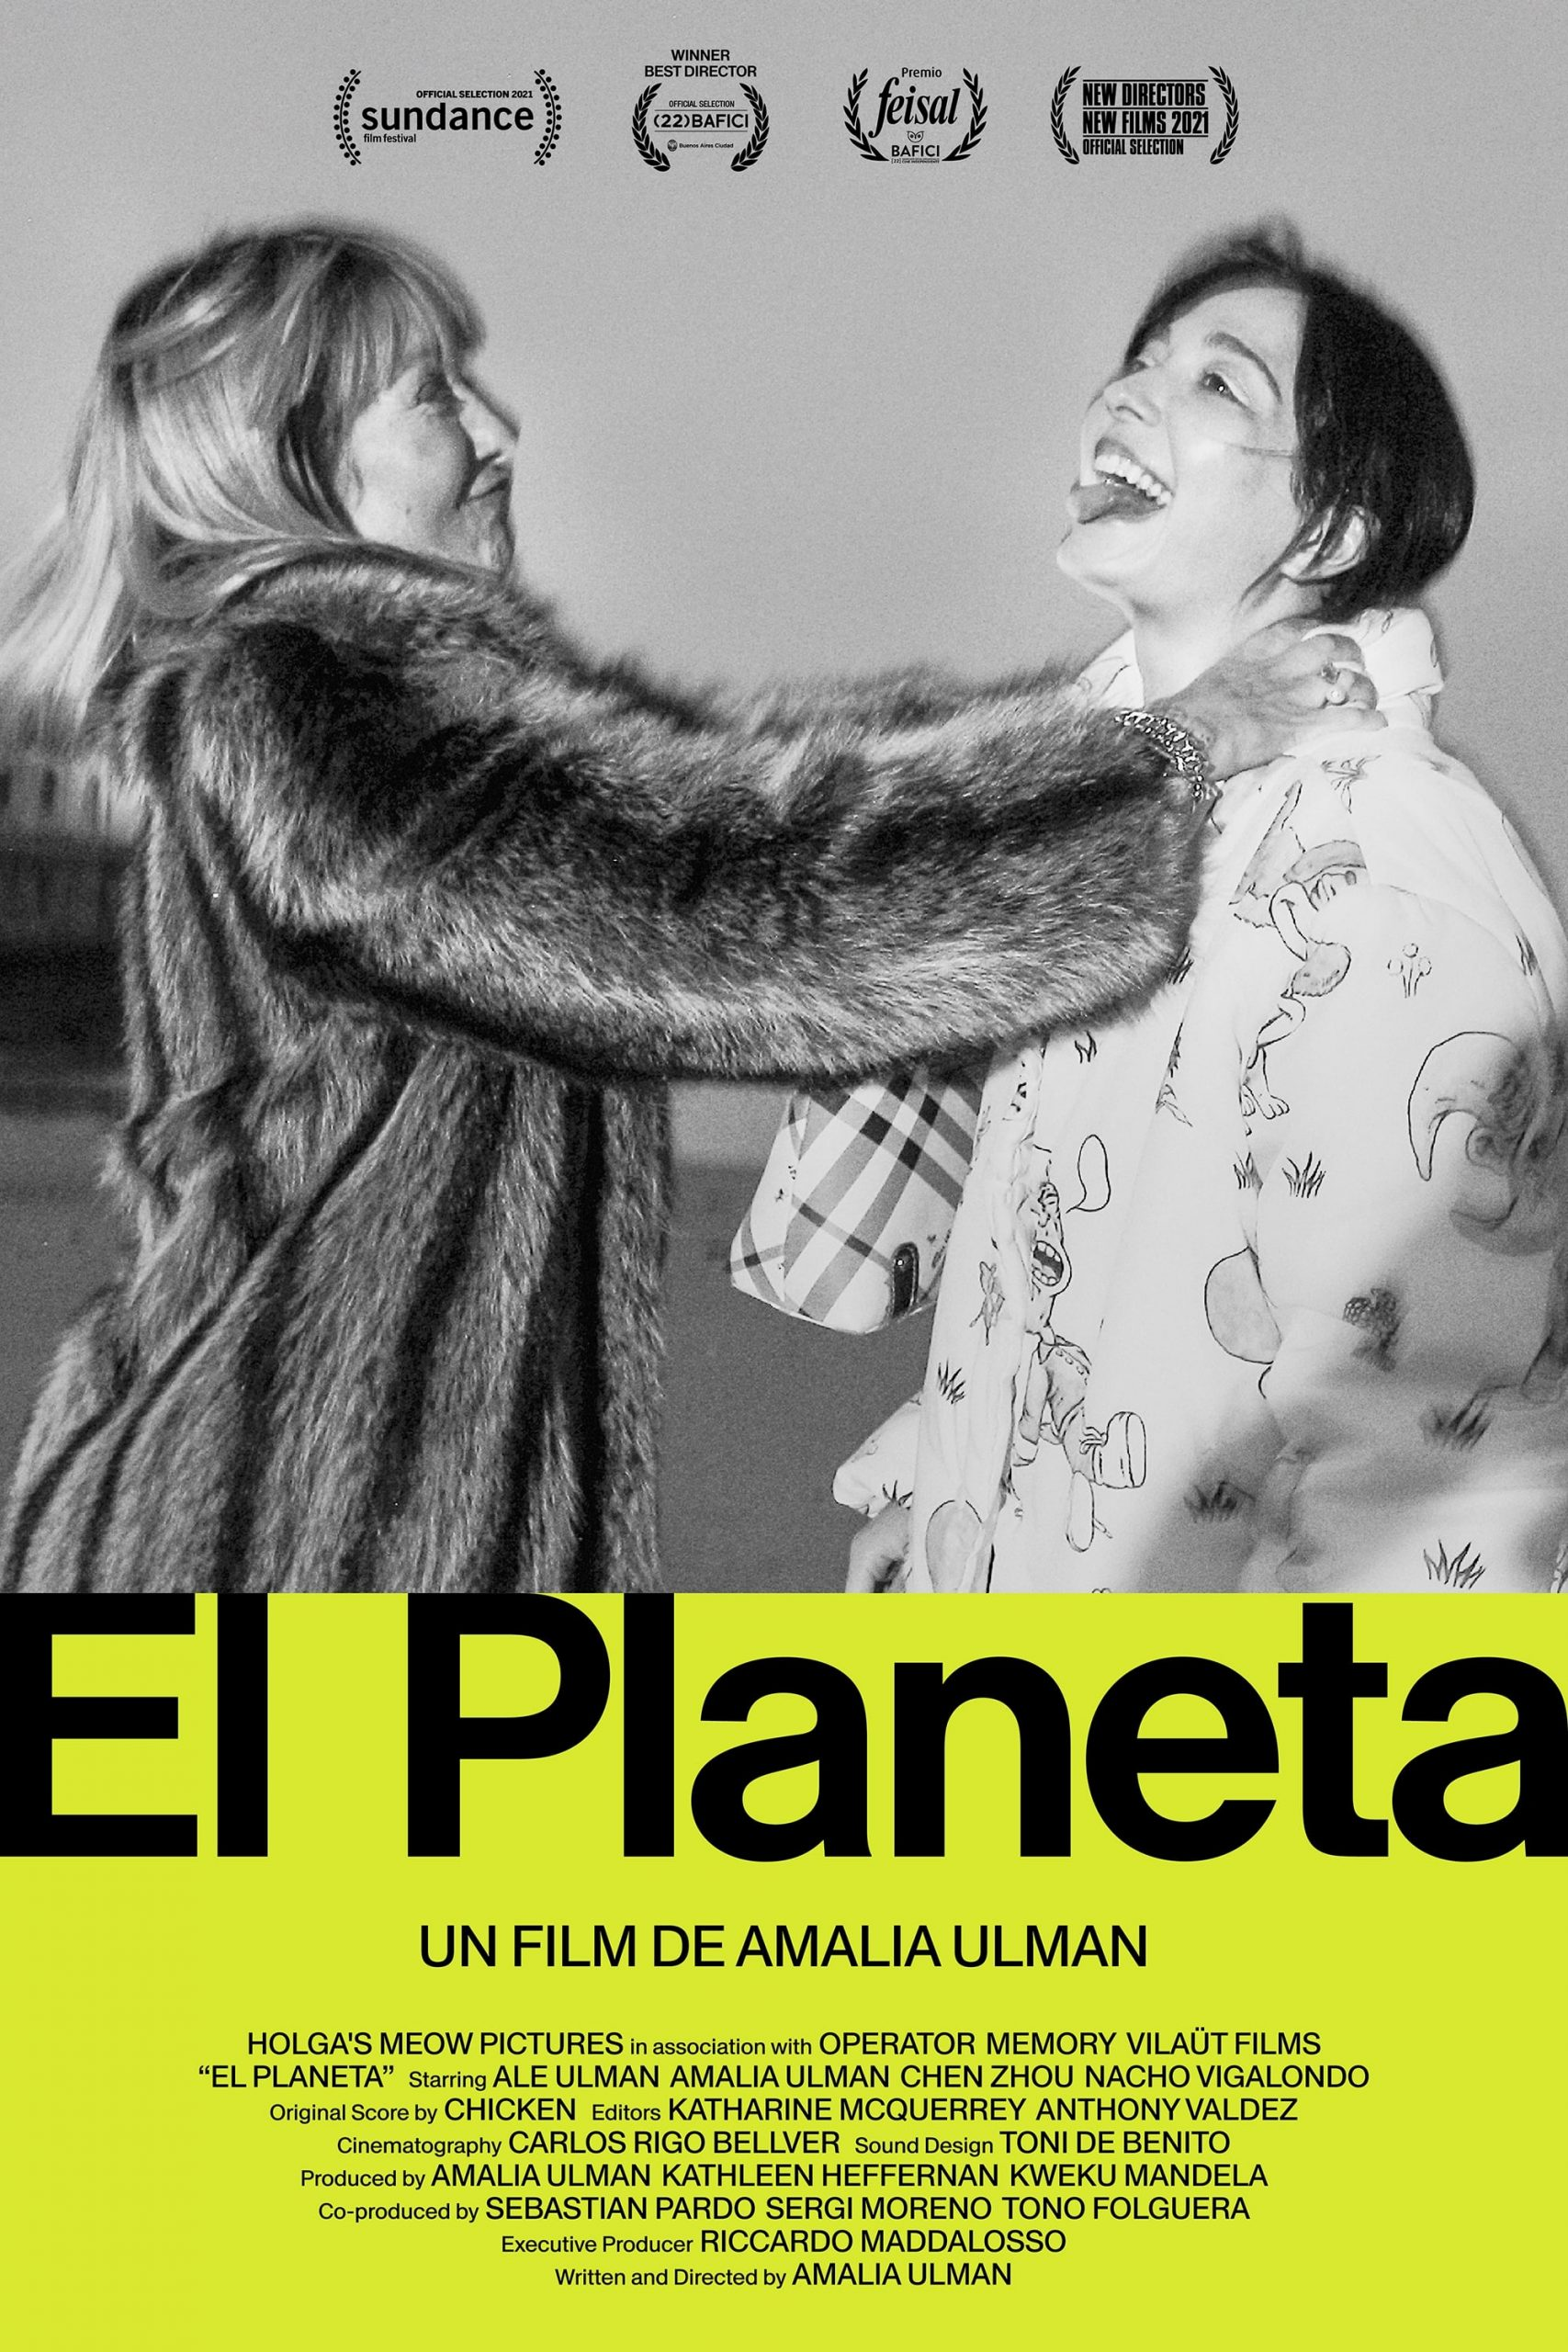 Poster for El Planeta